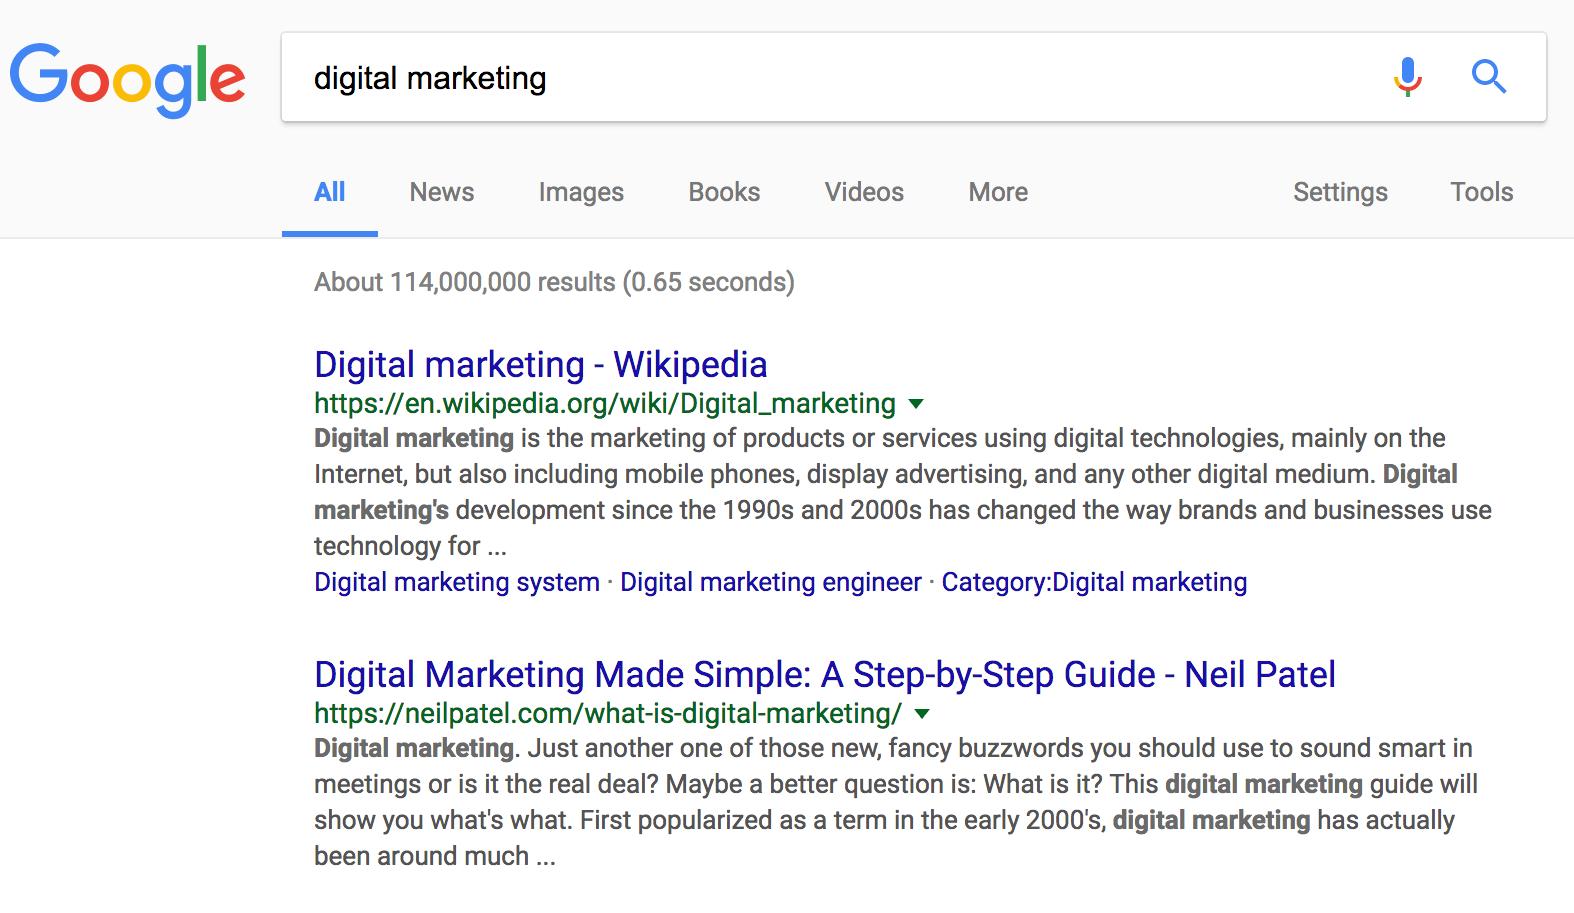 seo-keyword-research-google-serp-digital-marketing-organic-results.png